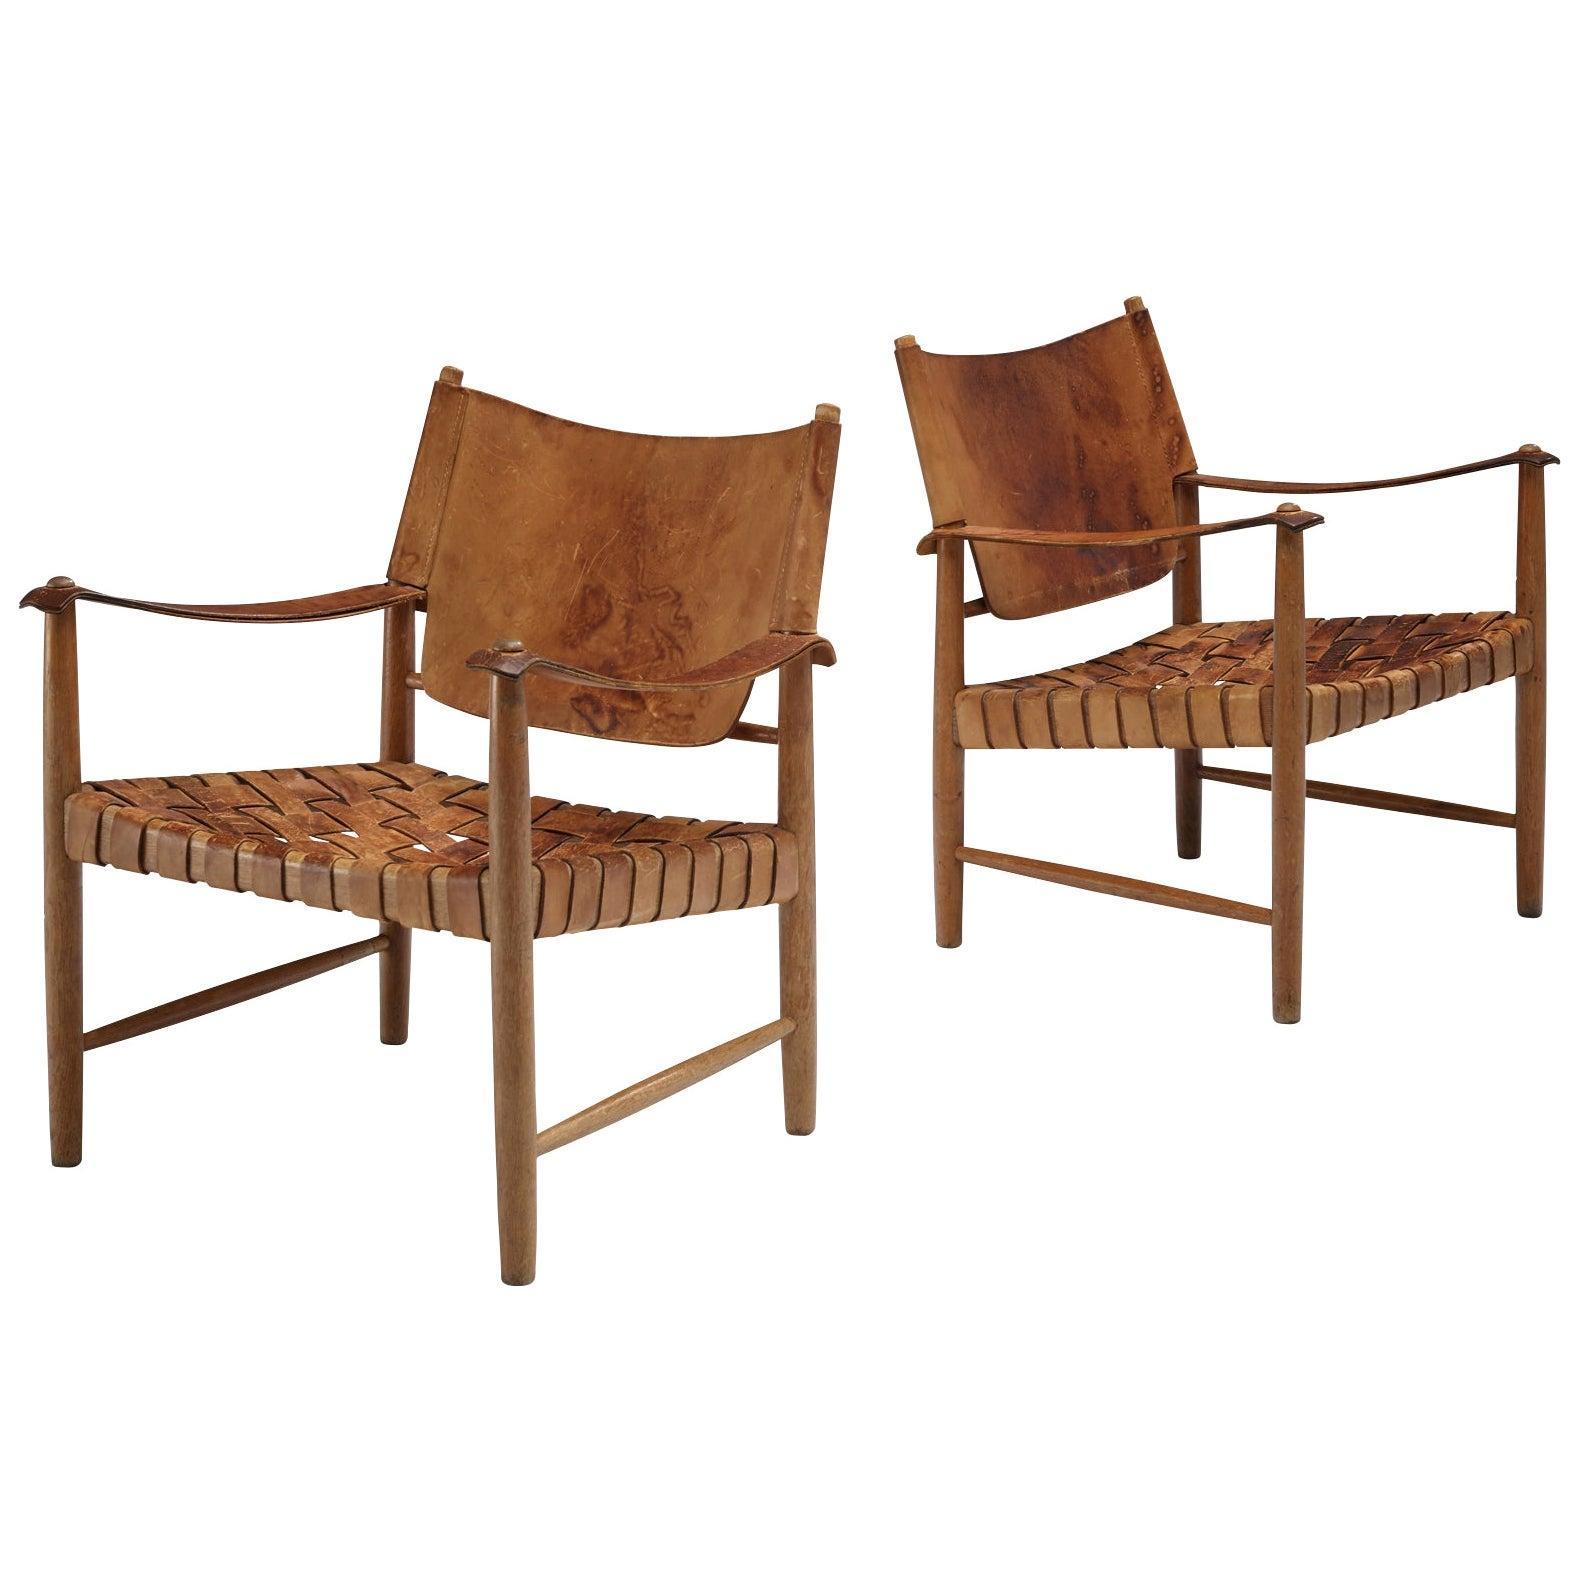 Danish Cognac Leather Safari Chairs, 1950s